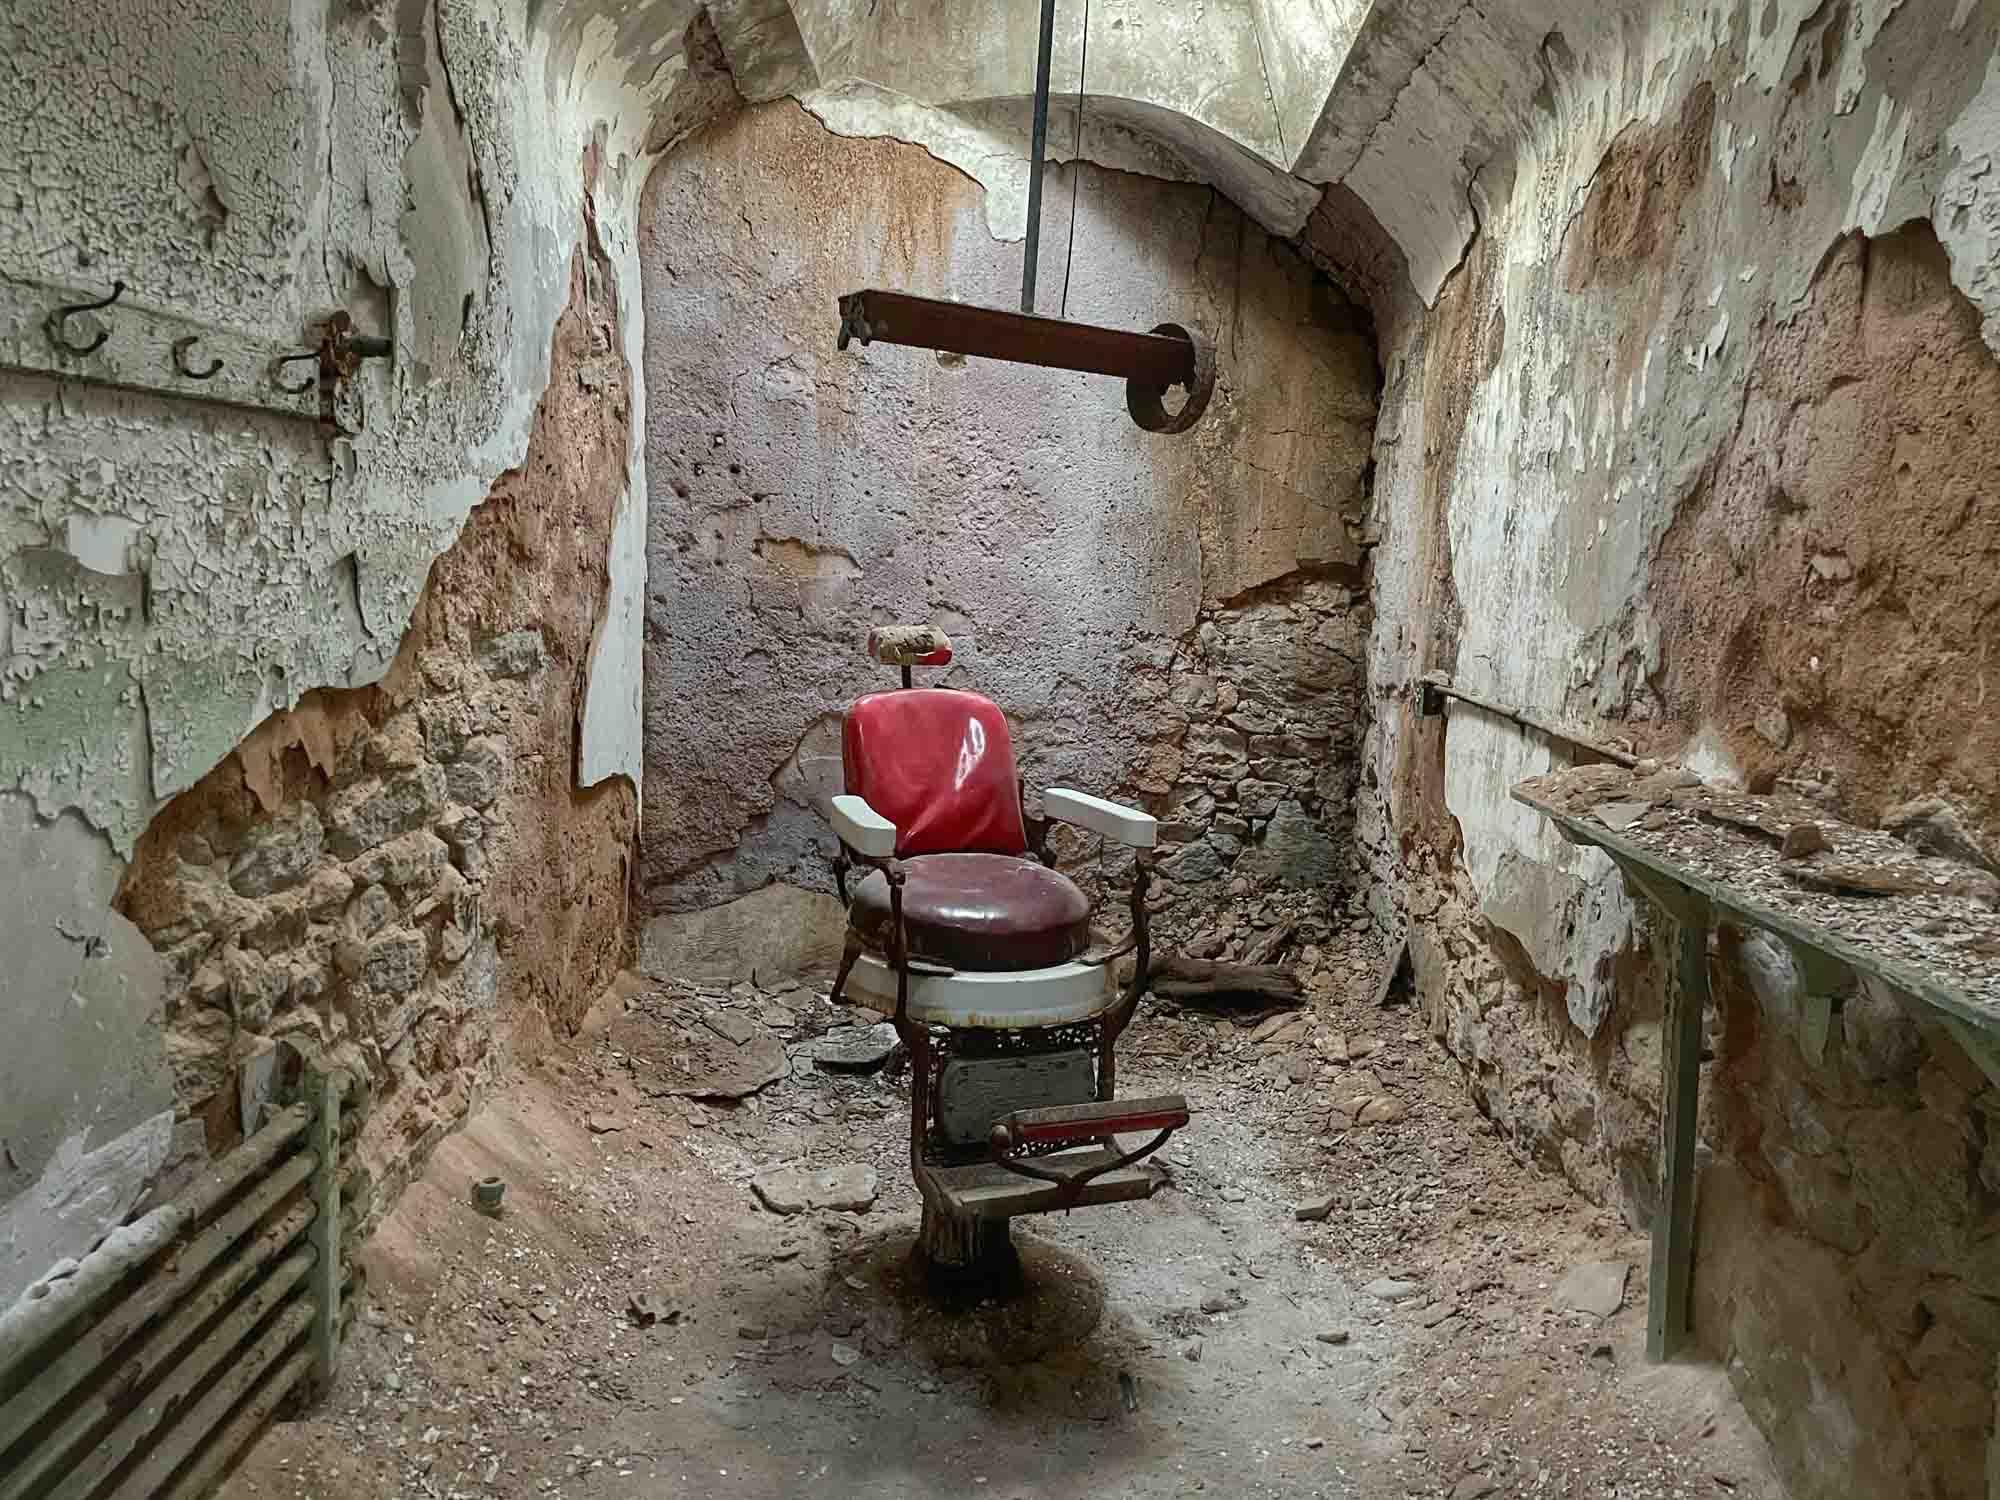 Barber chair in debris-filled room